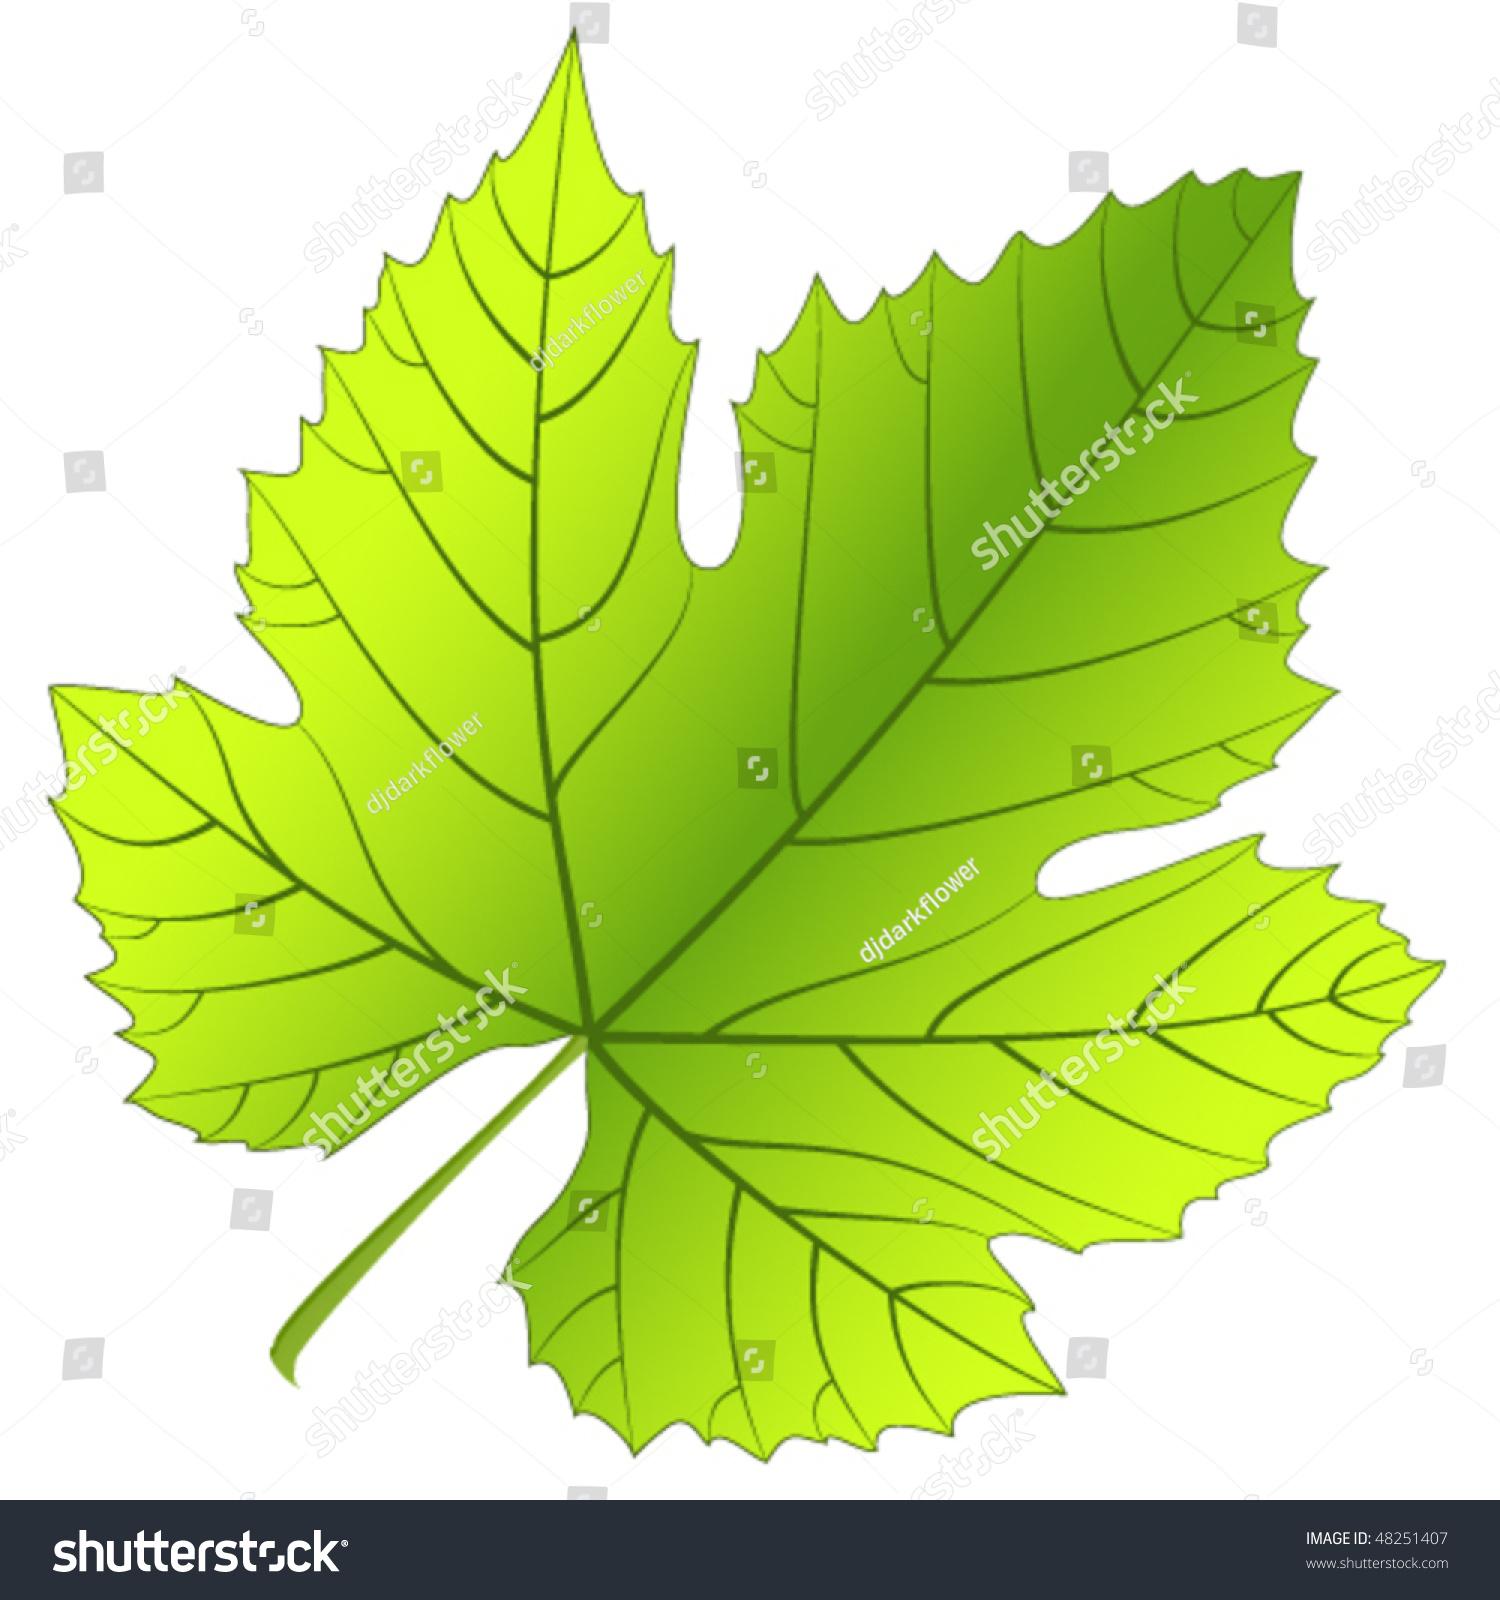 Vine Leaf Stock Images, Royalty-Free Images & Vectors ...